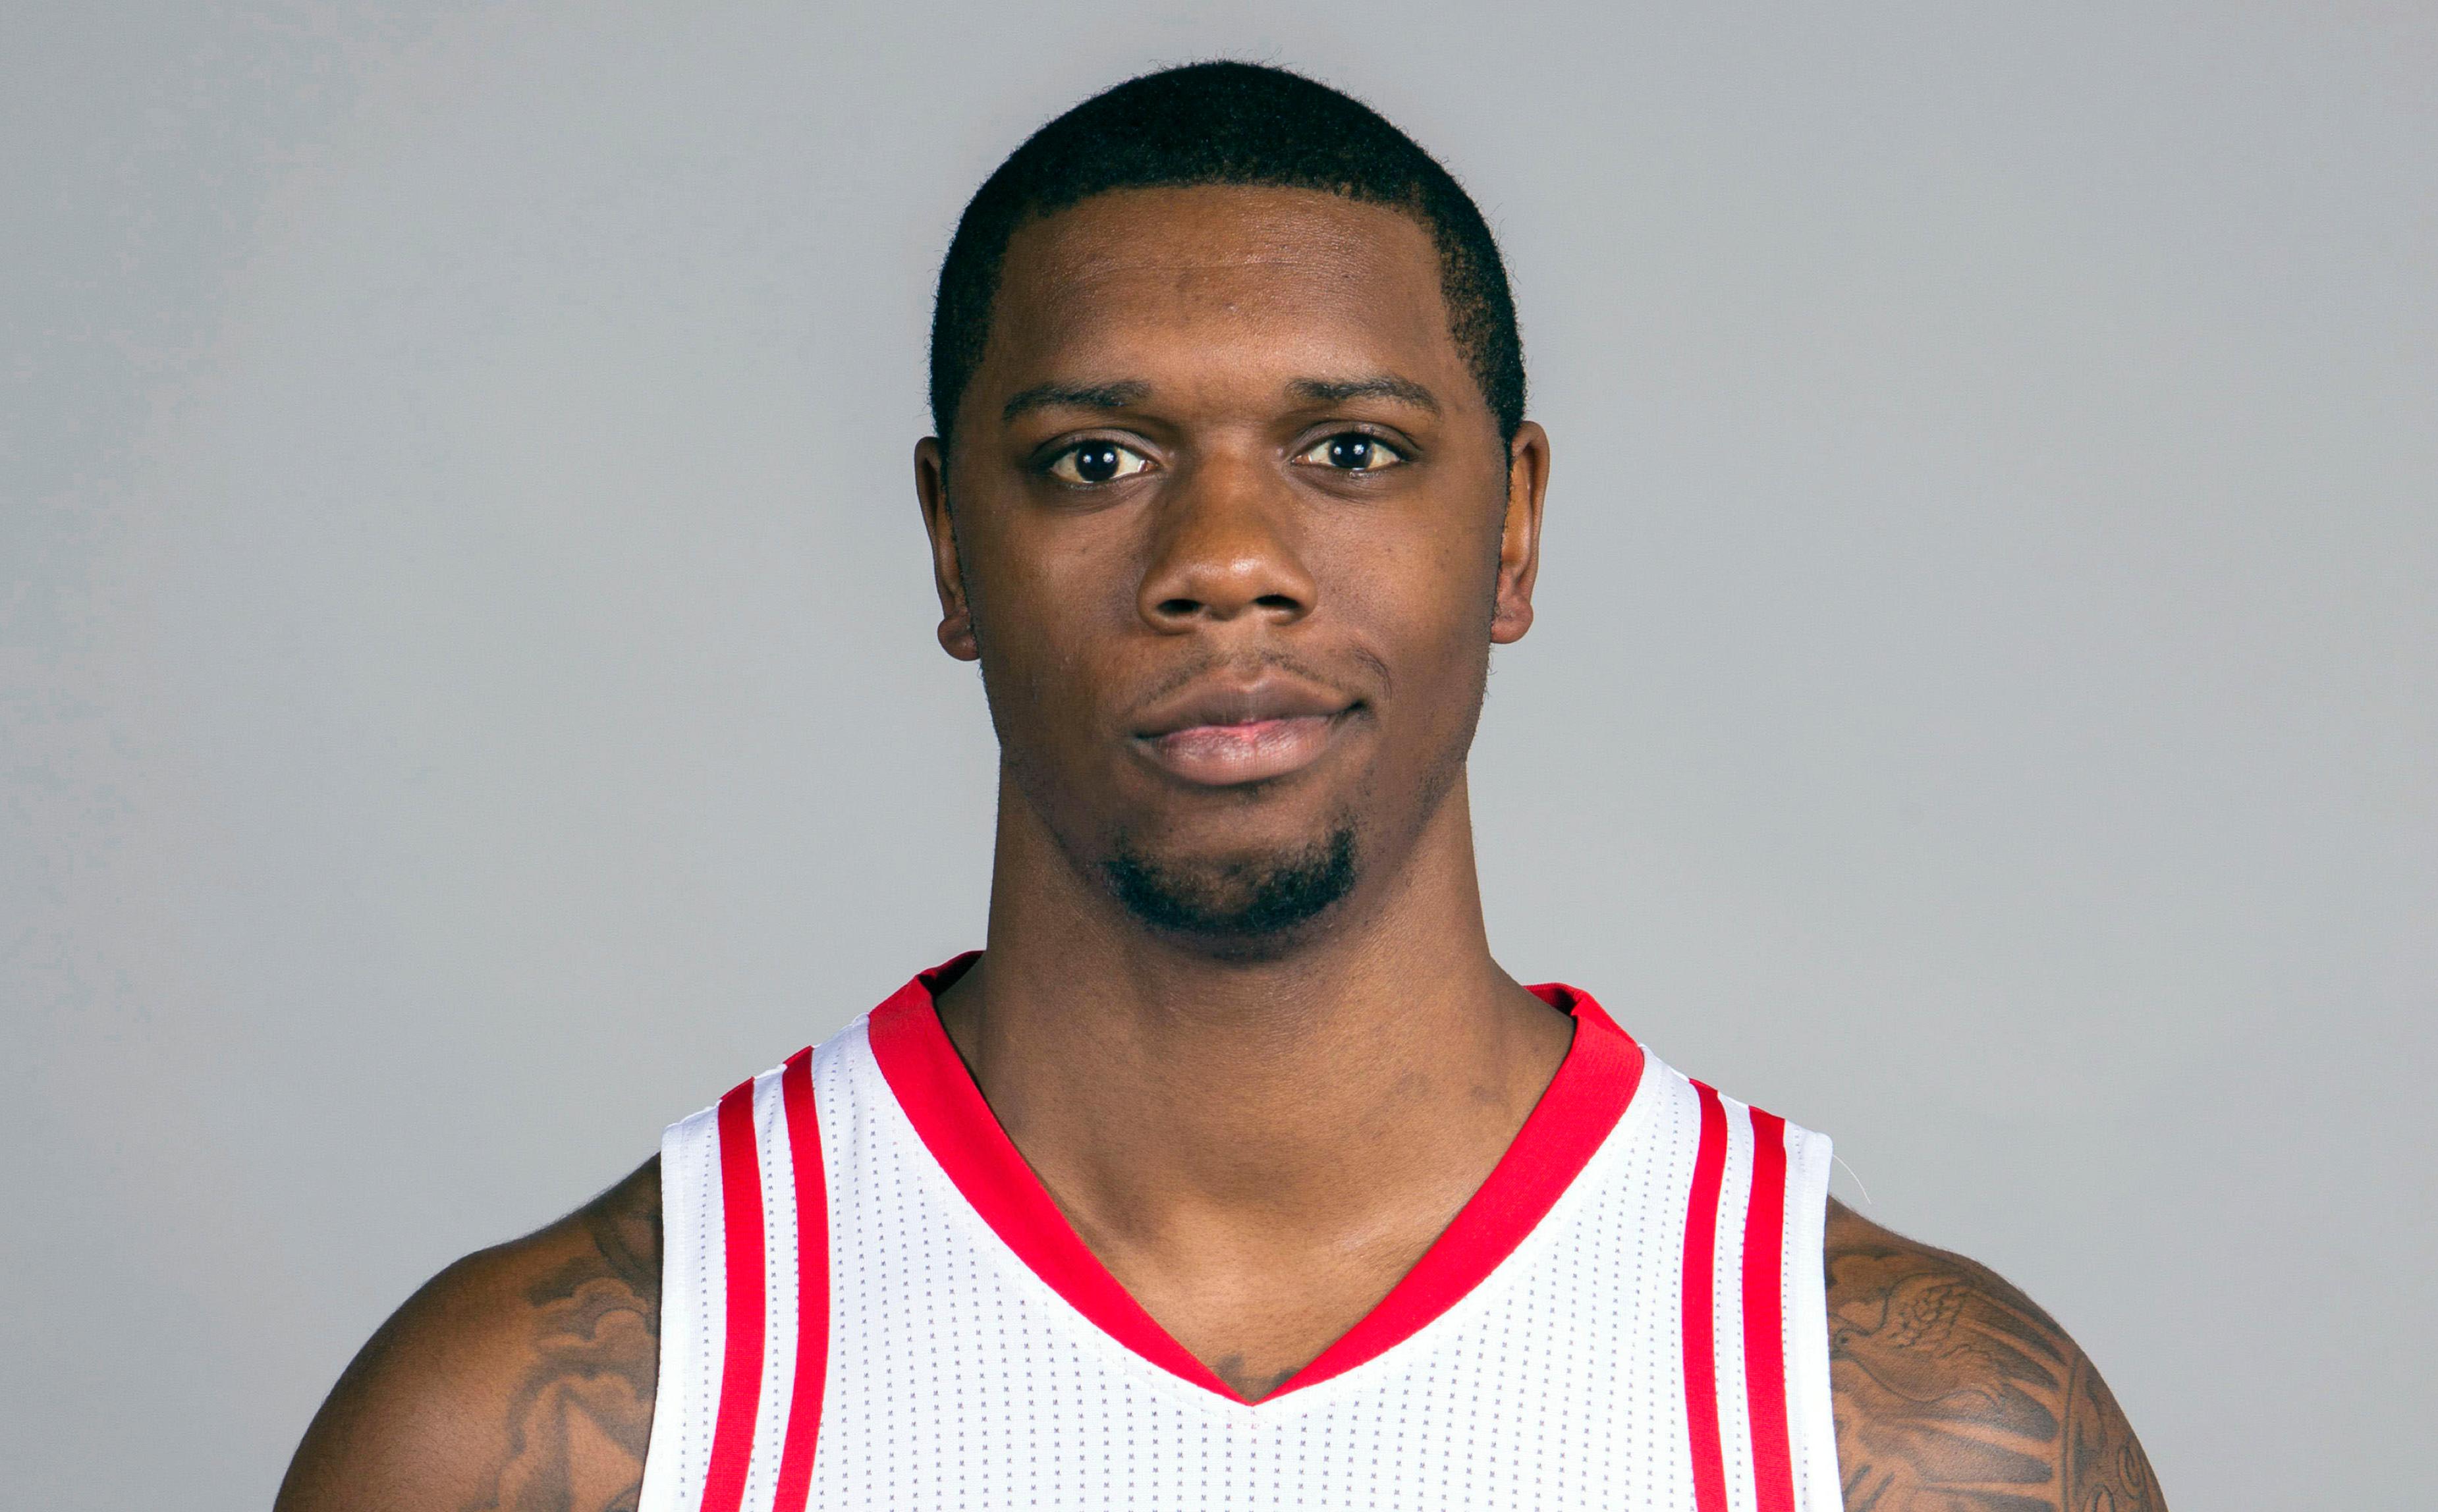 Sep 28, 2015; Houston, TX, USA; Houston Rockets forward Terrence Jones (6) during media day at Toyota Center. Mandatory Credit: